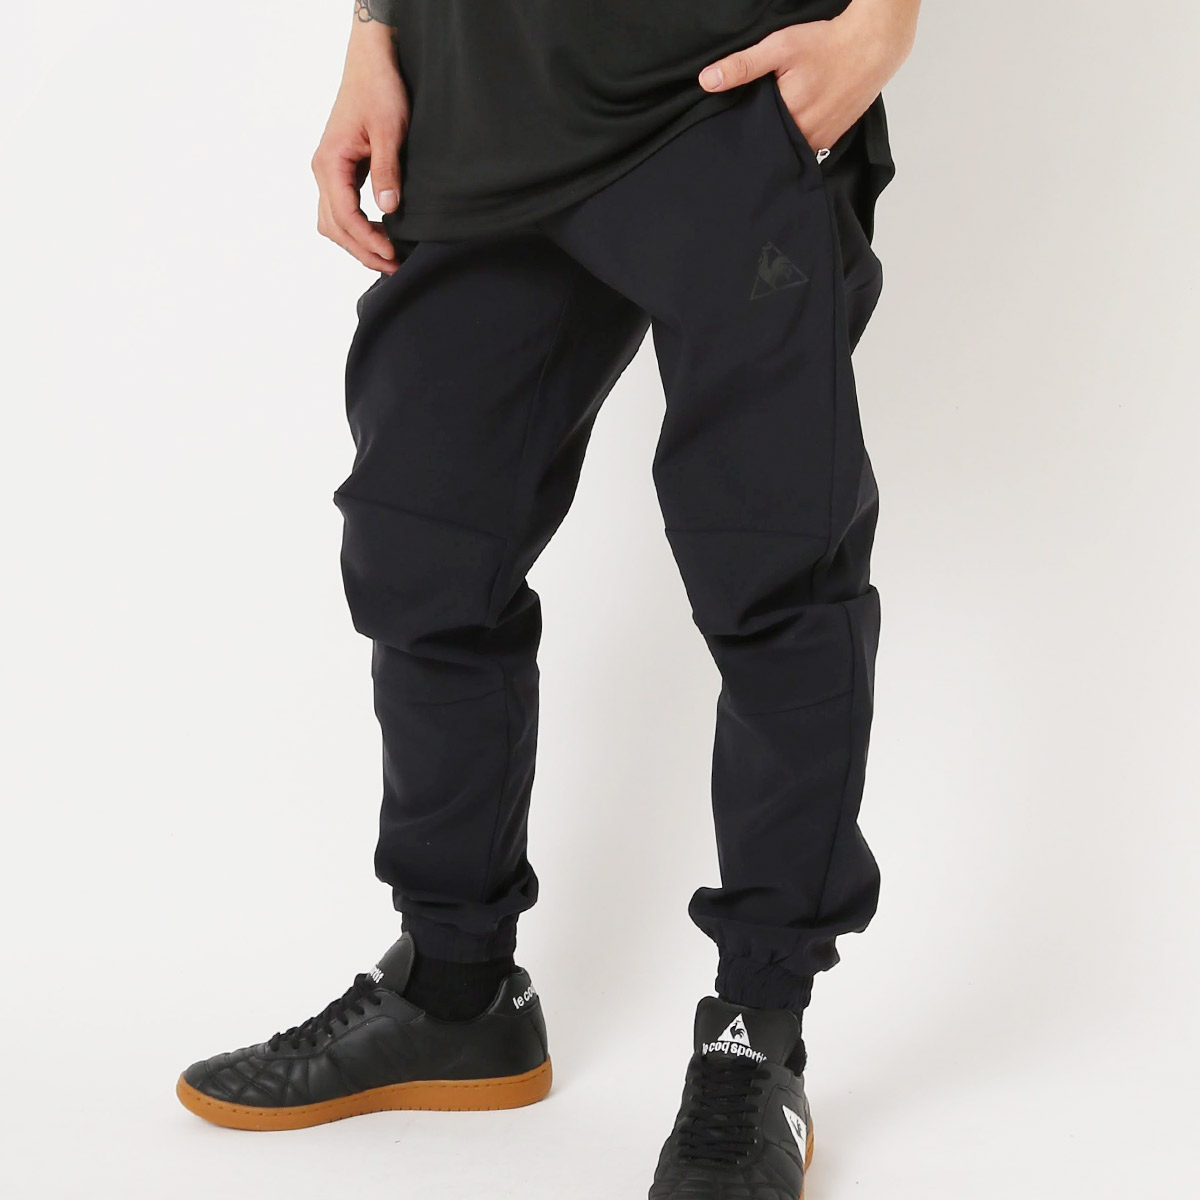 le coq sportif TAPERED PANTS(ルコックスポルティフ テ-パ-ド パンツ)BLK【メンズ パンツ】18SS-S